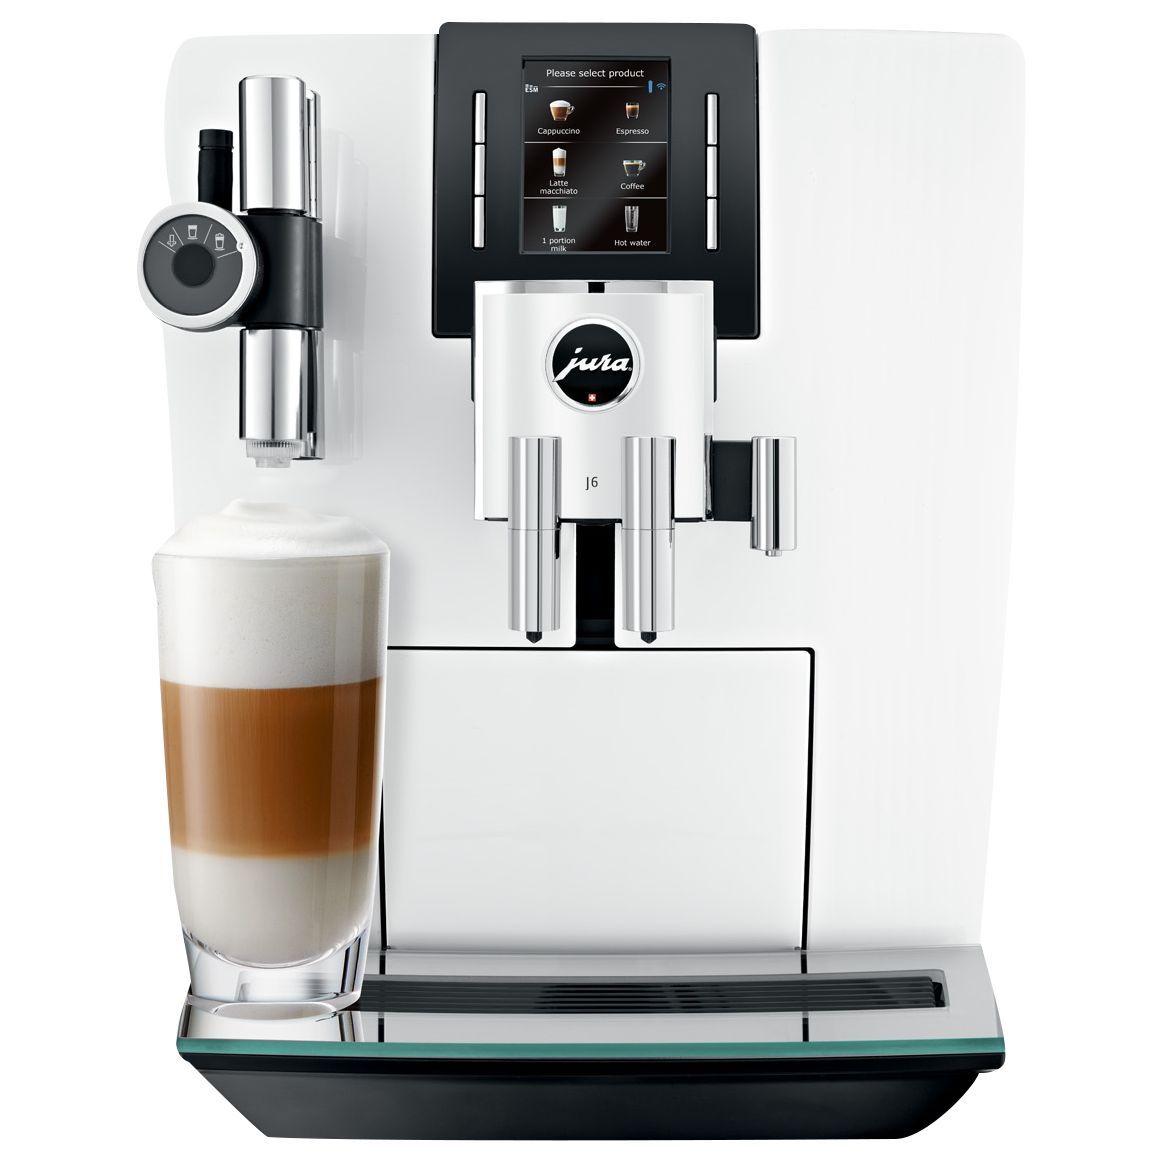 JURA J6 Bean-to-Cup Coffee Machine In 2020